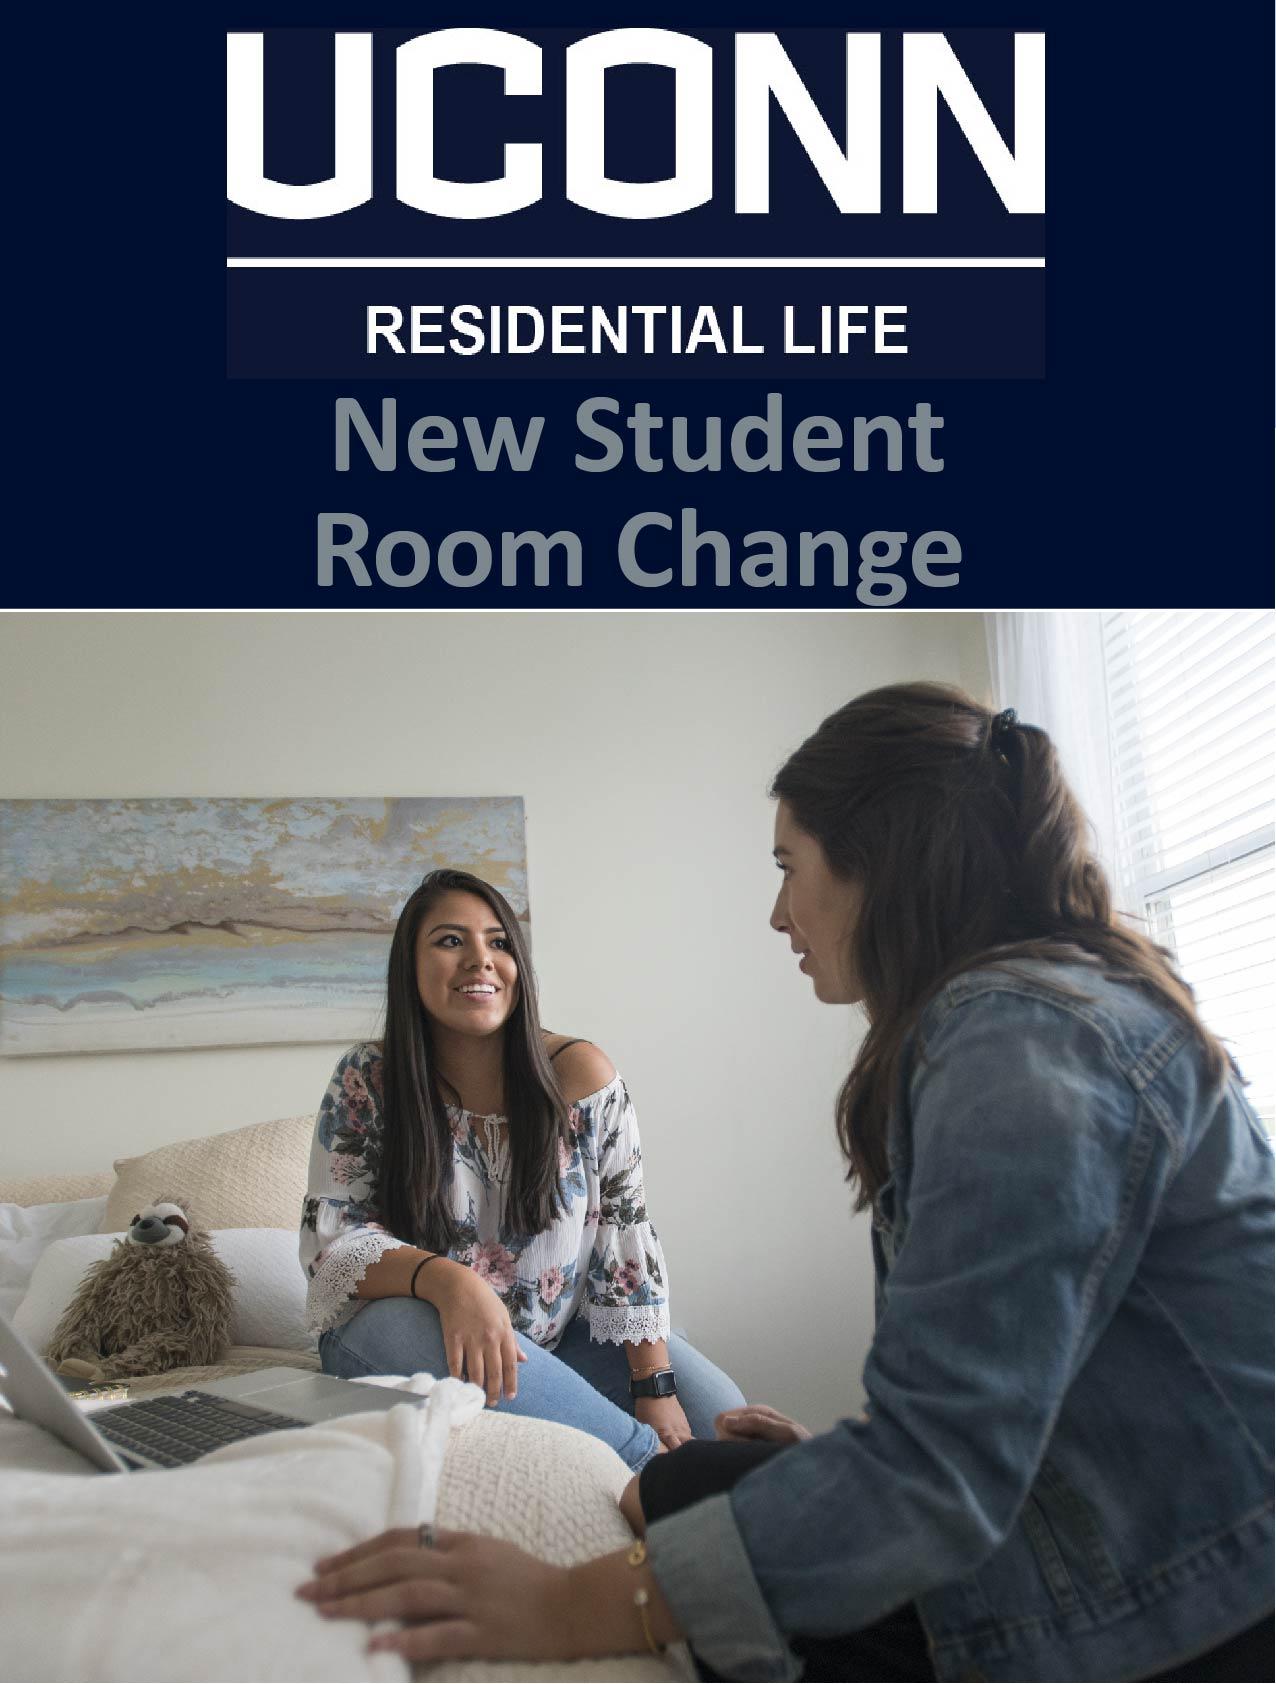 New Student Room Change